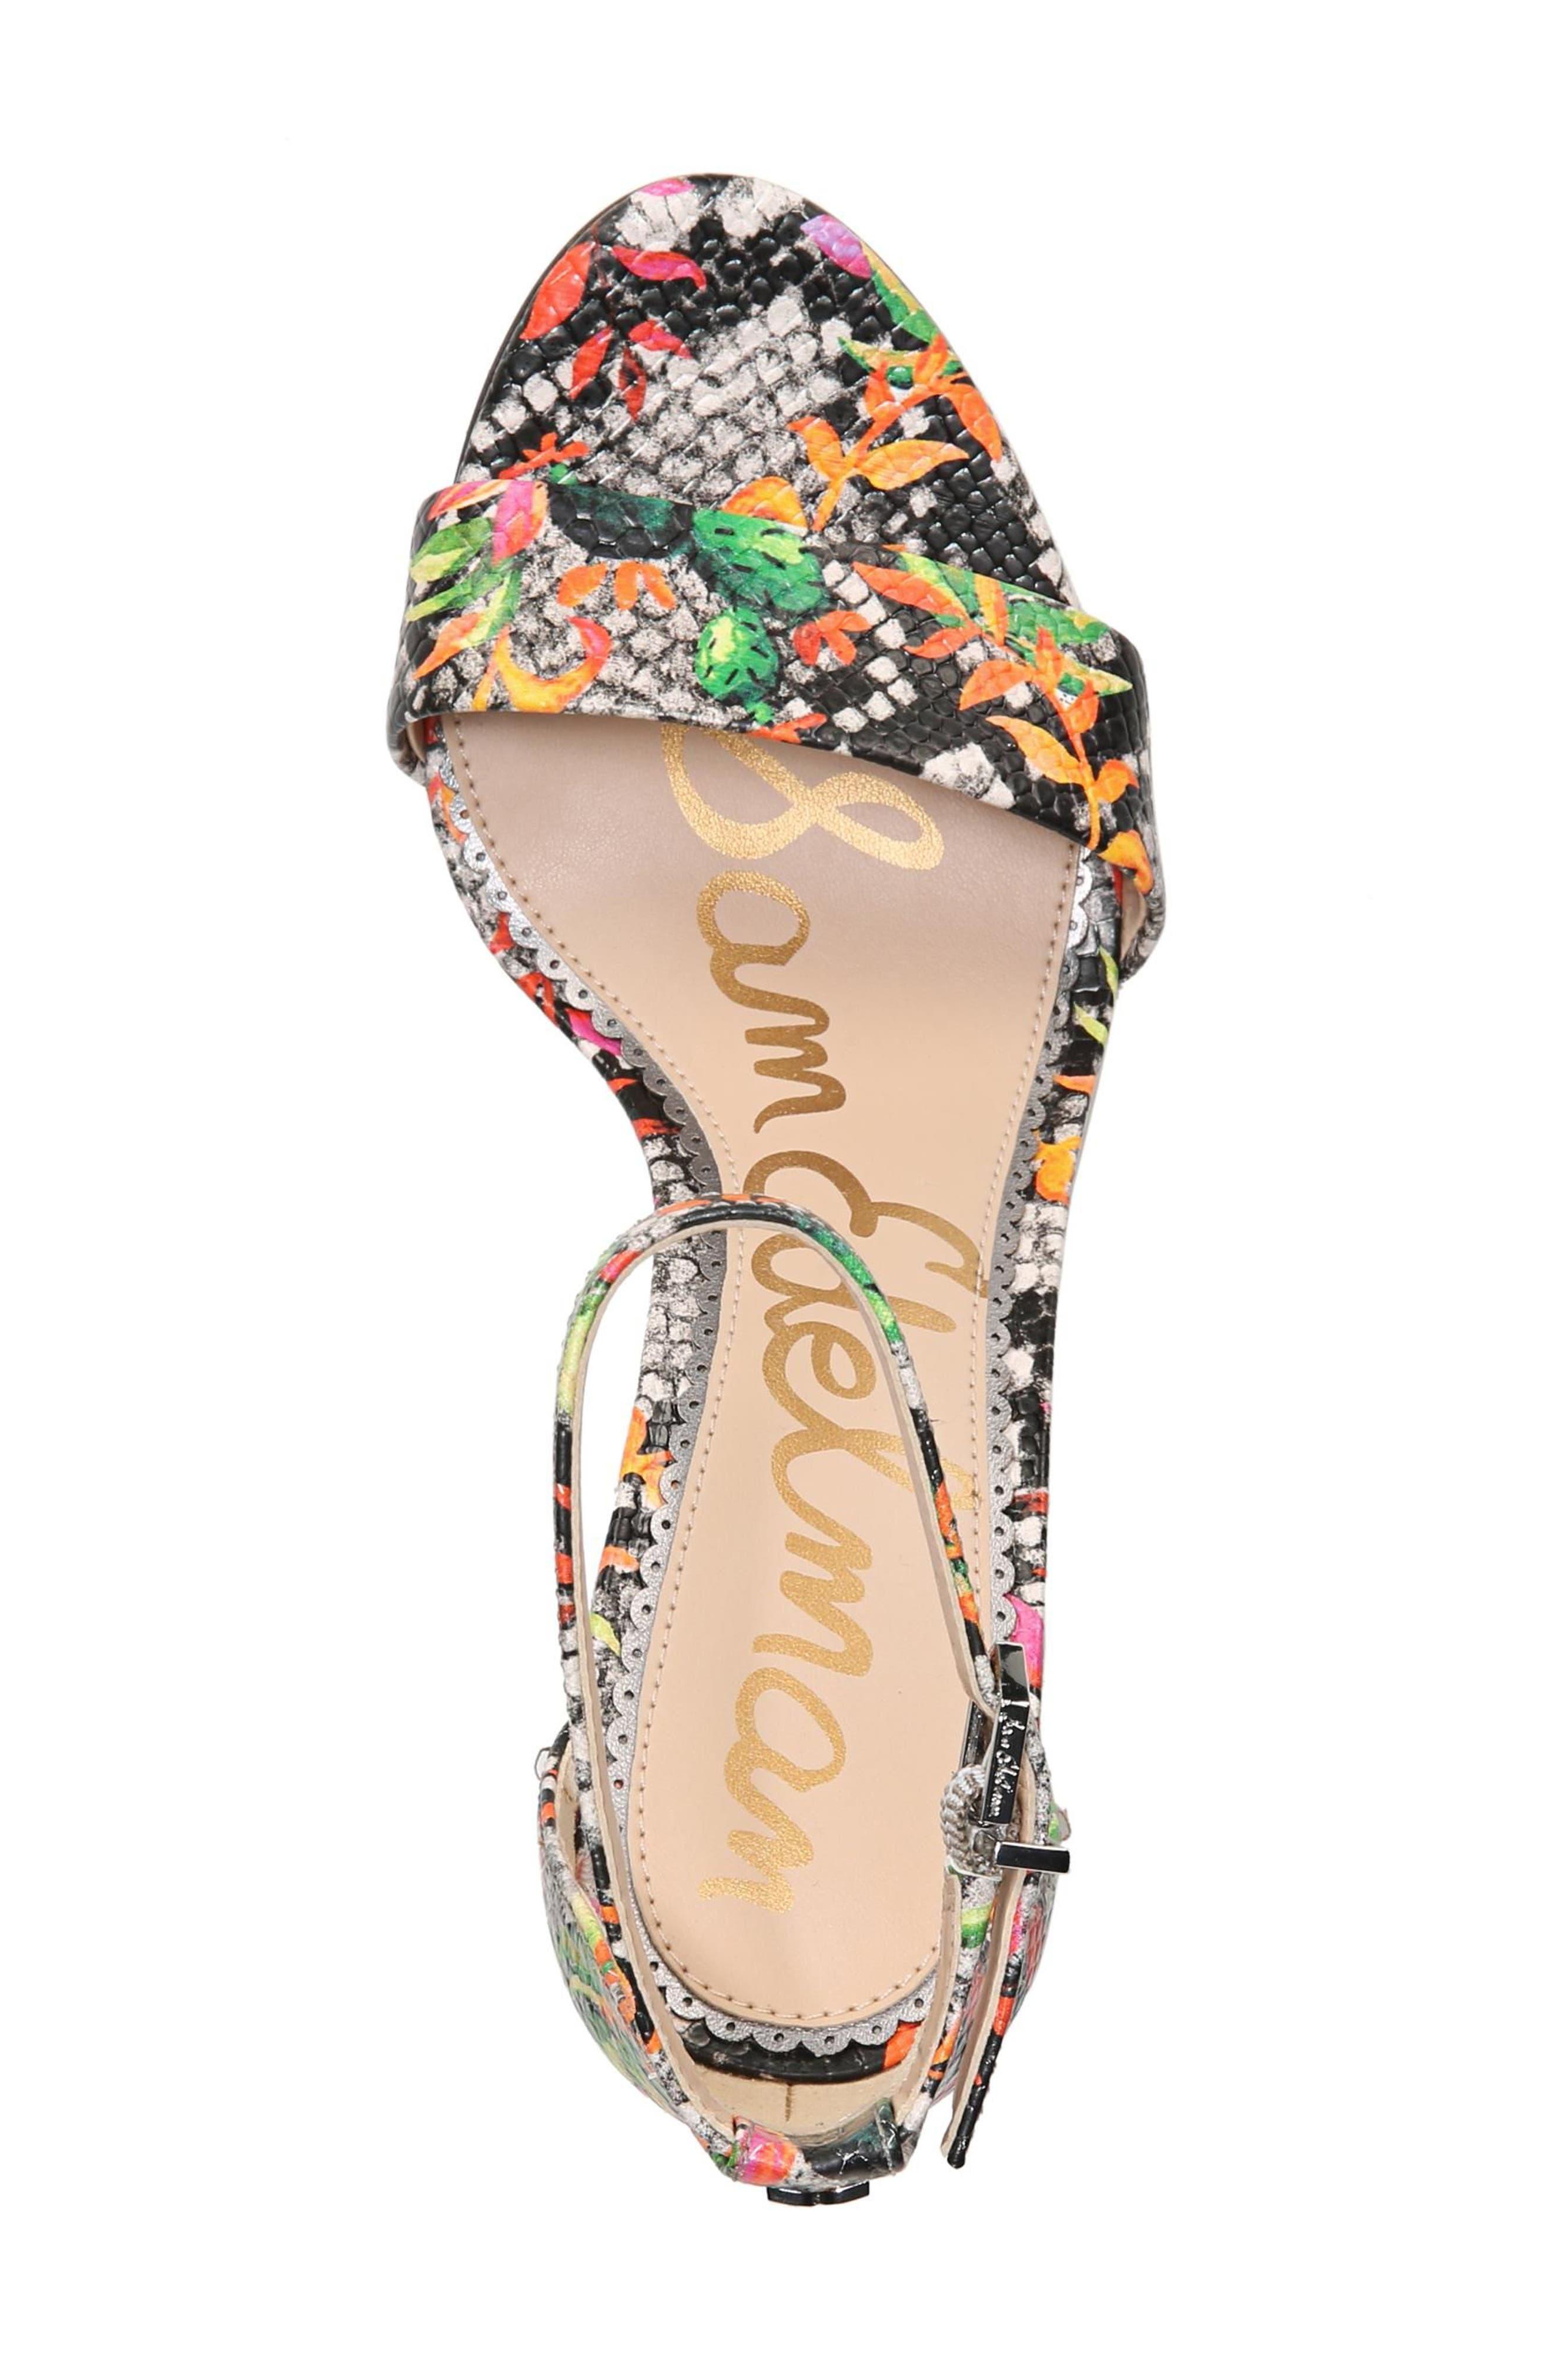 Yaro Ankle Strap Sandal,                             Alternate thumbnail 6, color,                             Bright Multi Print